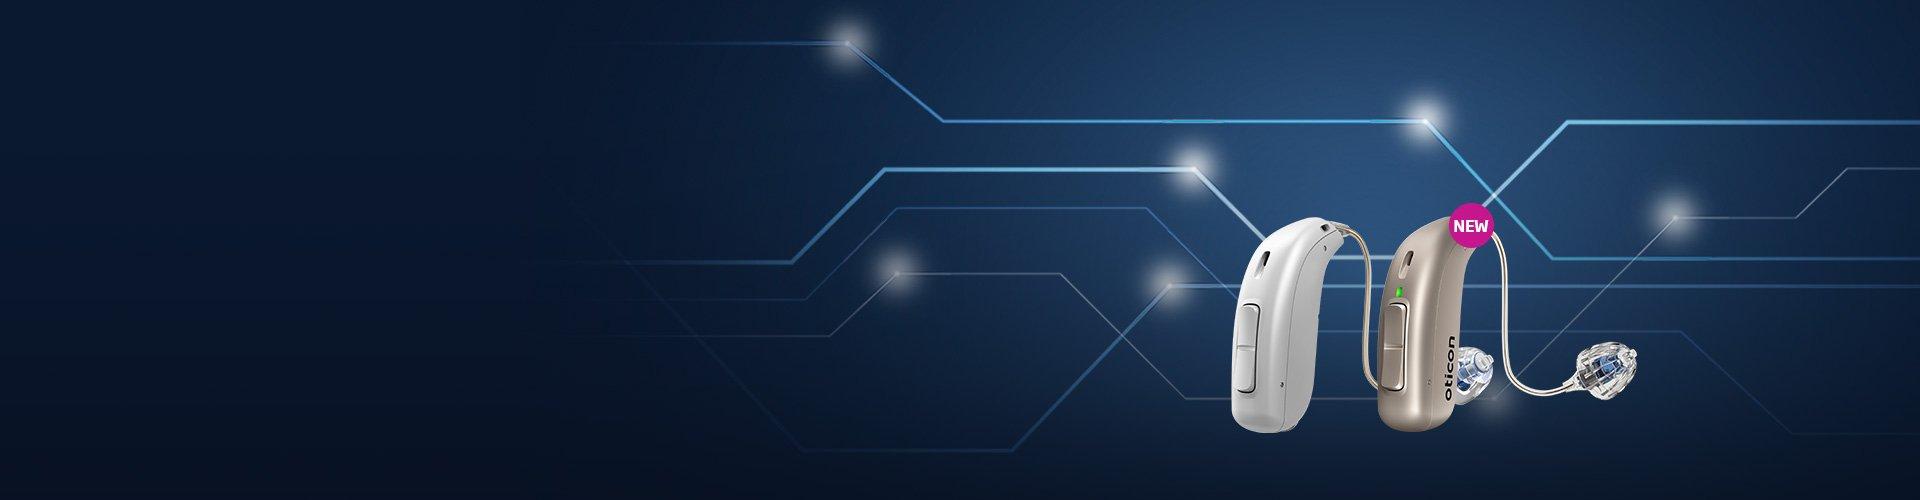 cros-technology-intro-banner-v2-